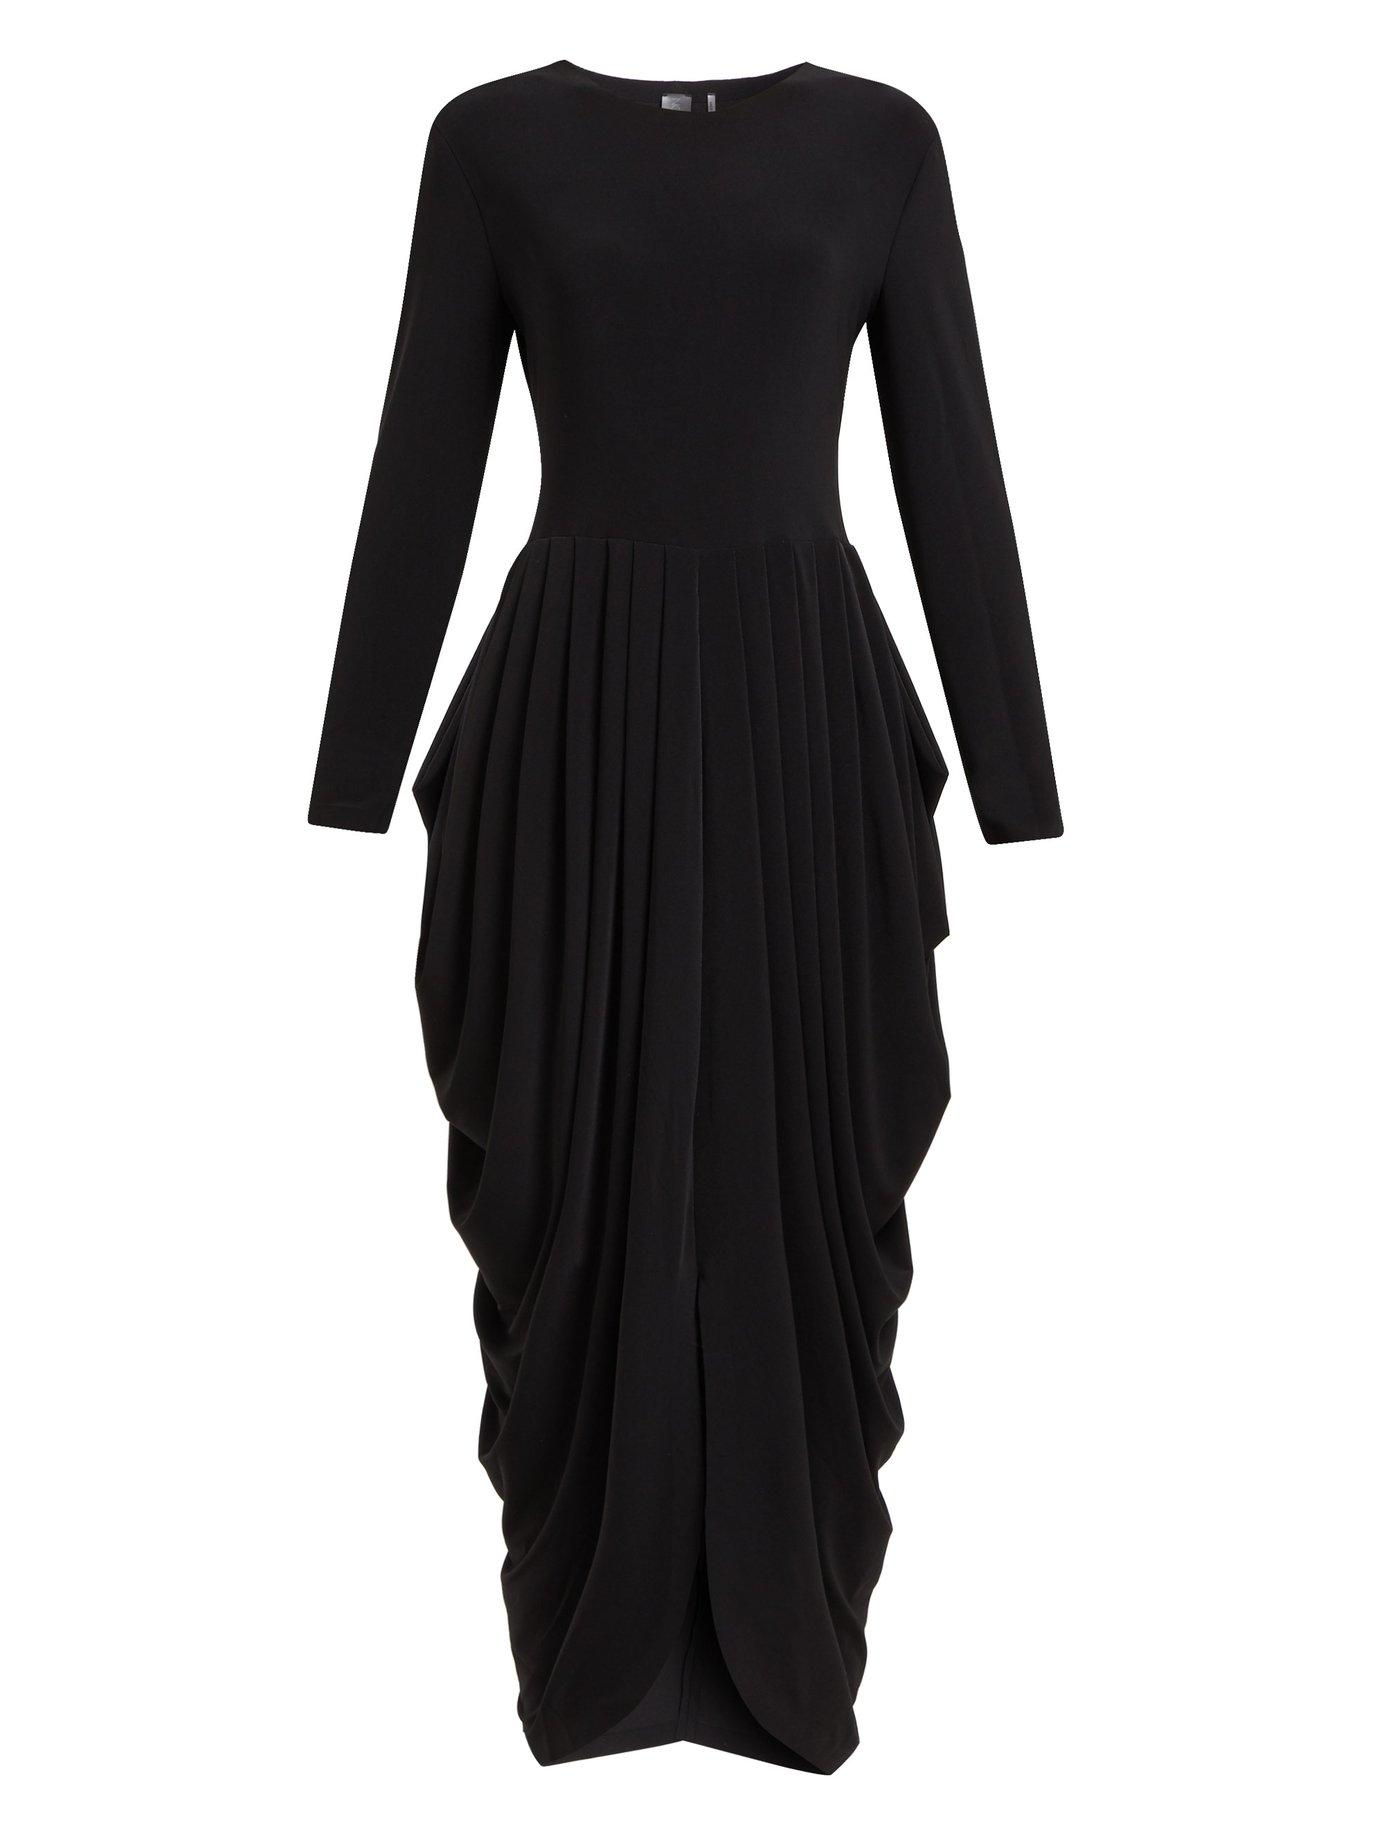 316b8dd0aee5 Lyst - Norma Kamali Waterfall Pleated Jersey Dress in Black